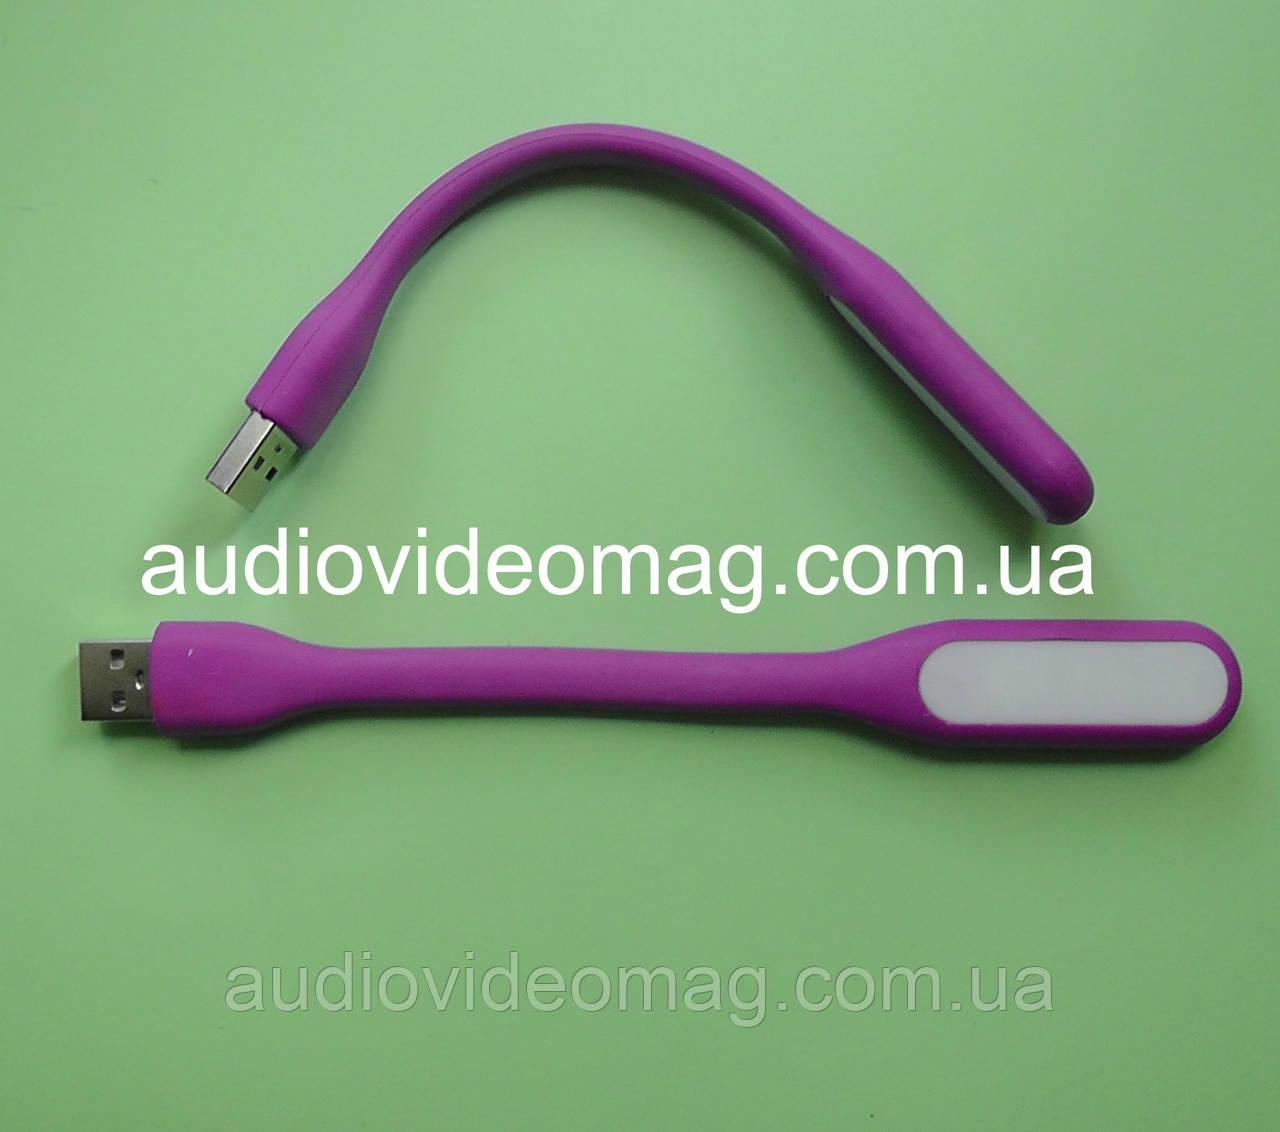 Гибкая USB LED подсветка - 6 светодиодов